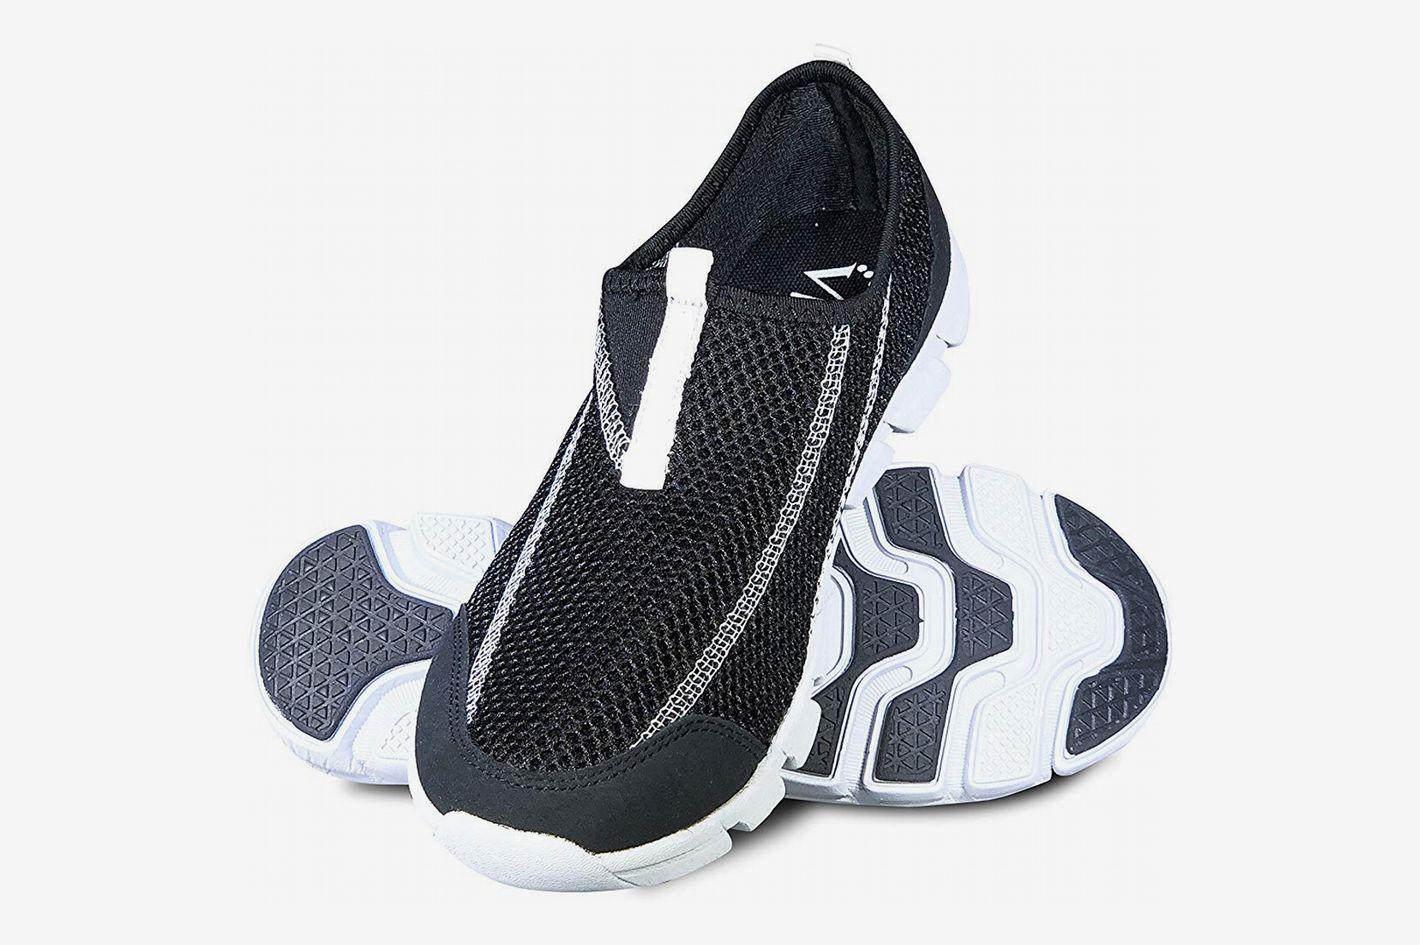 ccda552cd9 7 Best Water Shoes for Women 2019